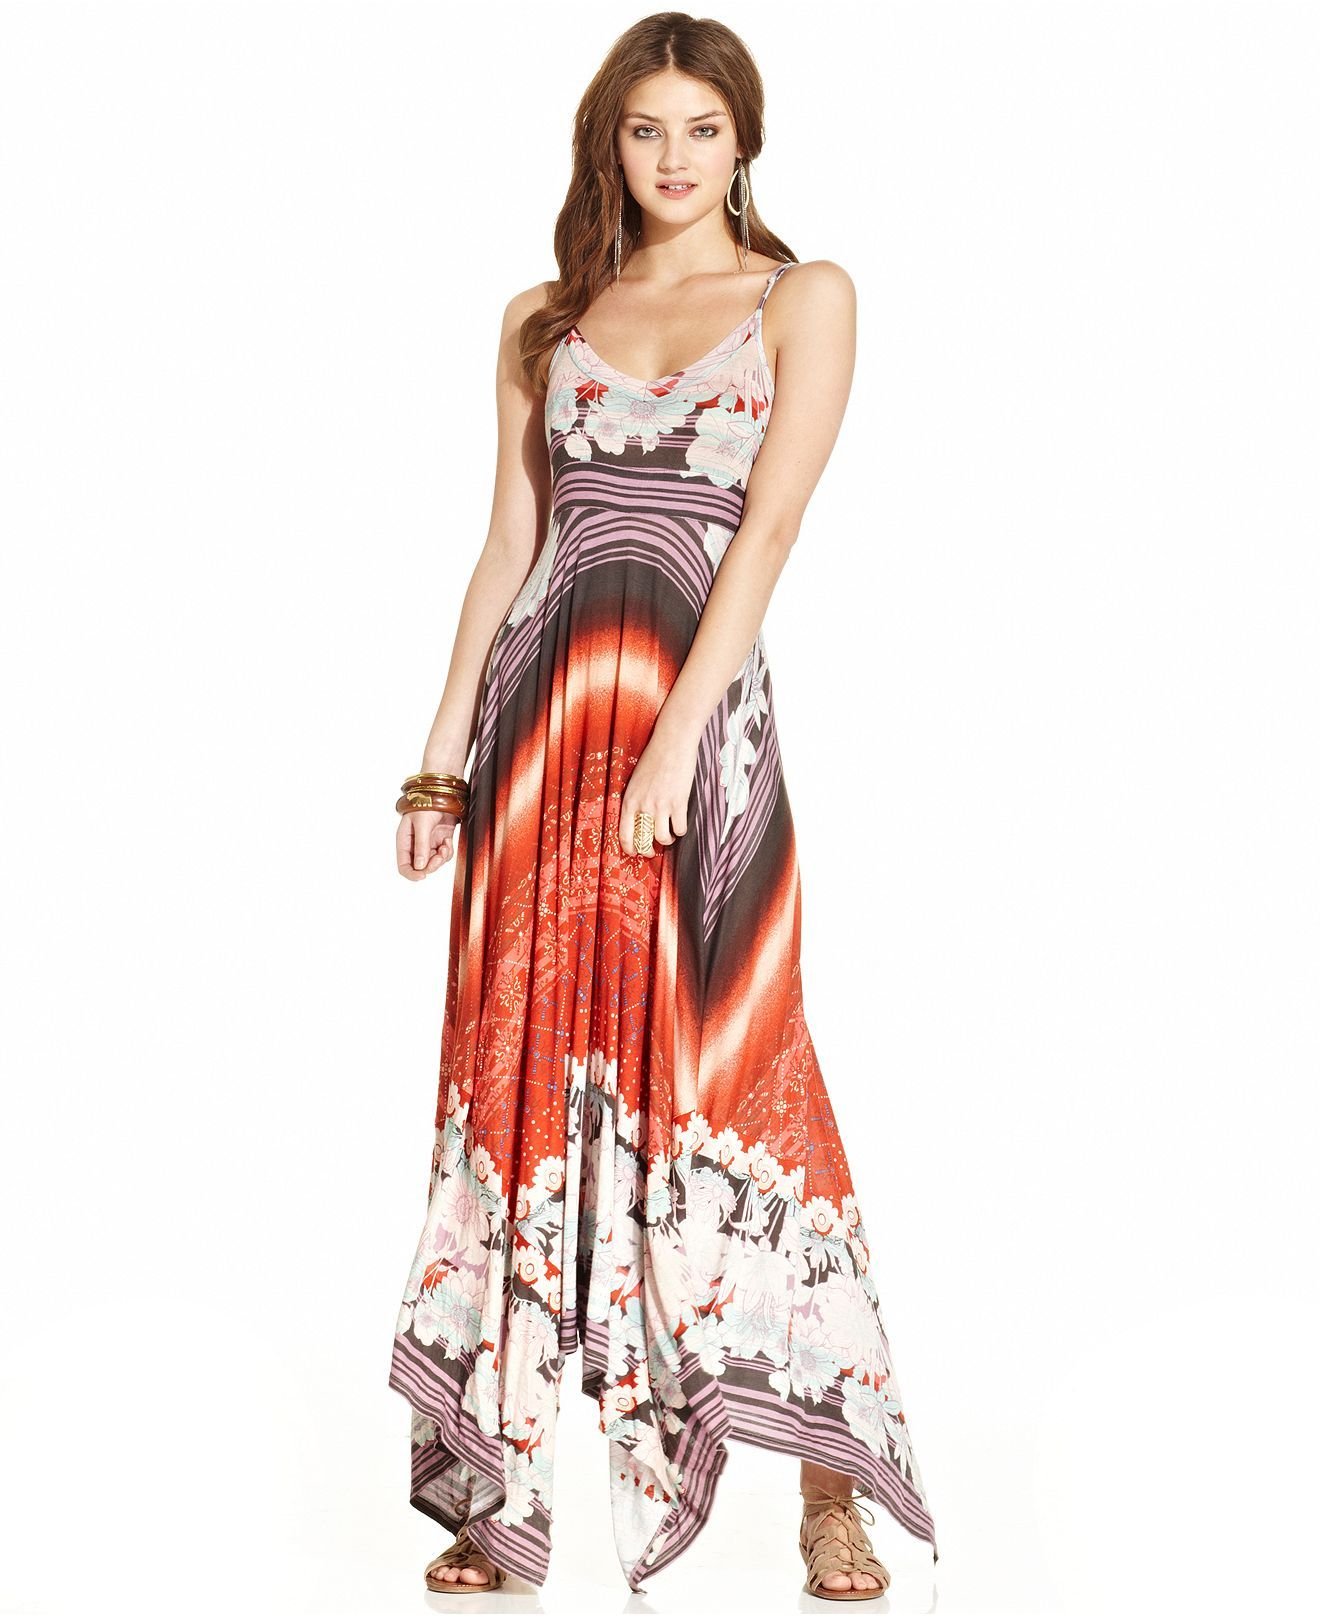 d2cb115df8 American Rag Printed Handkerchief-Hem Maxi Dress - Dresses - Women - Macy s